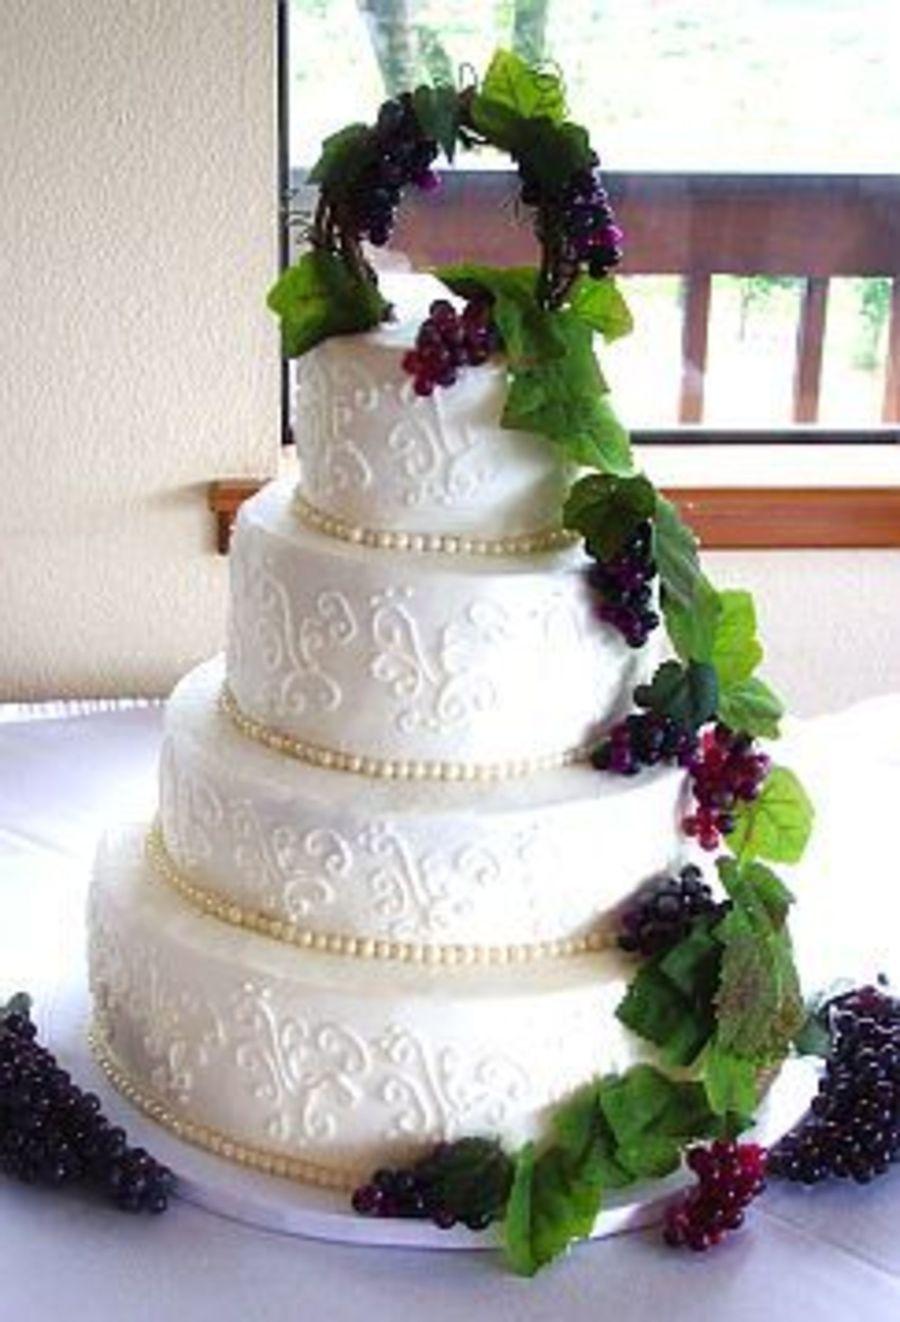 Luxury Vineyard Wedding Cakes Component - Wedding Idea 2018 ...